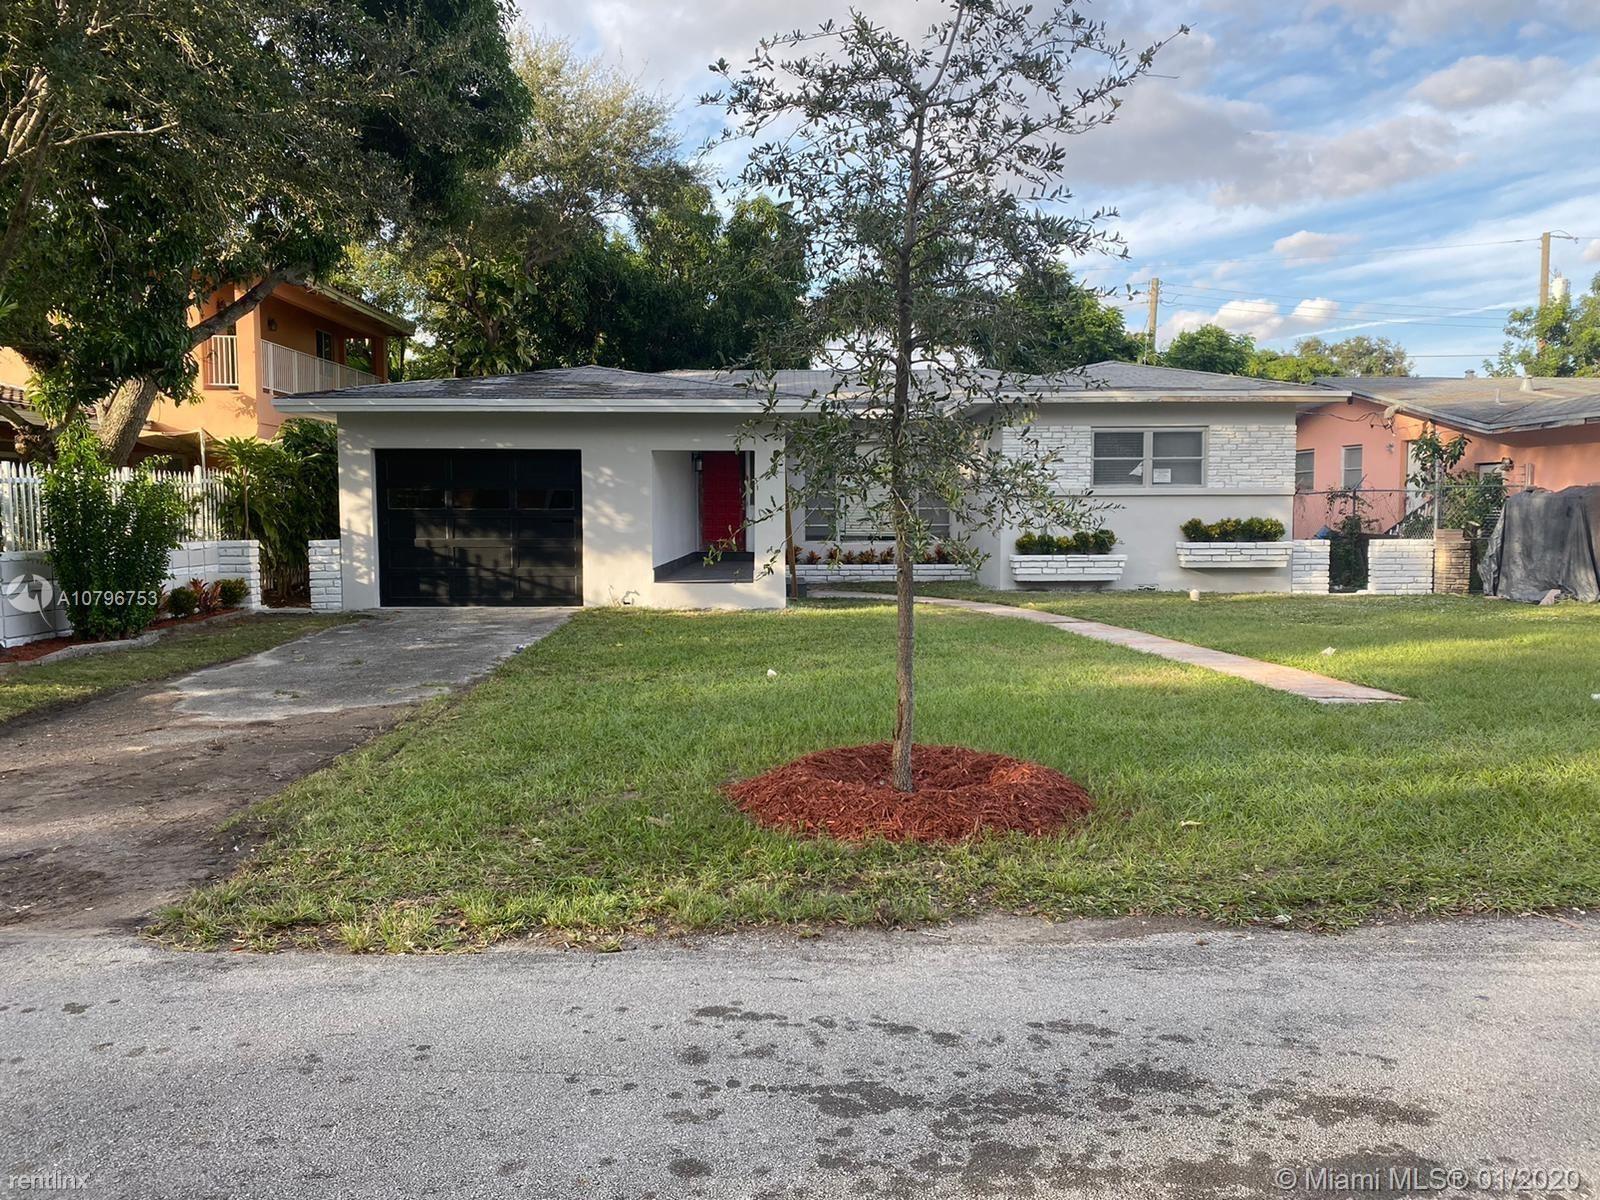 3471 Florida Ave, Coconut Grove, FL - $2,700